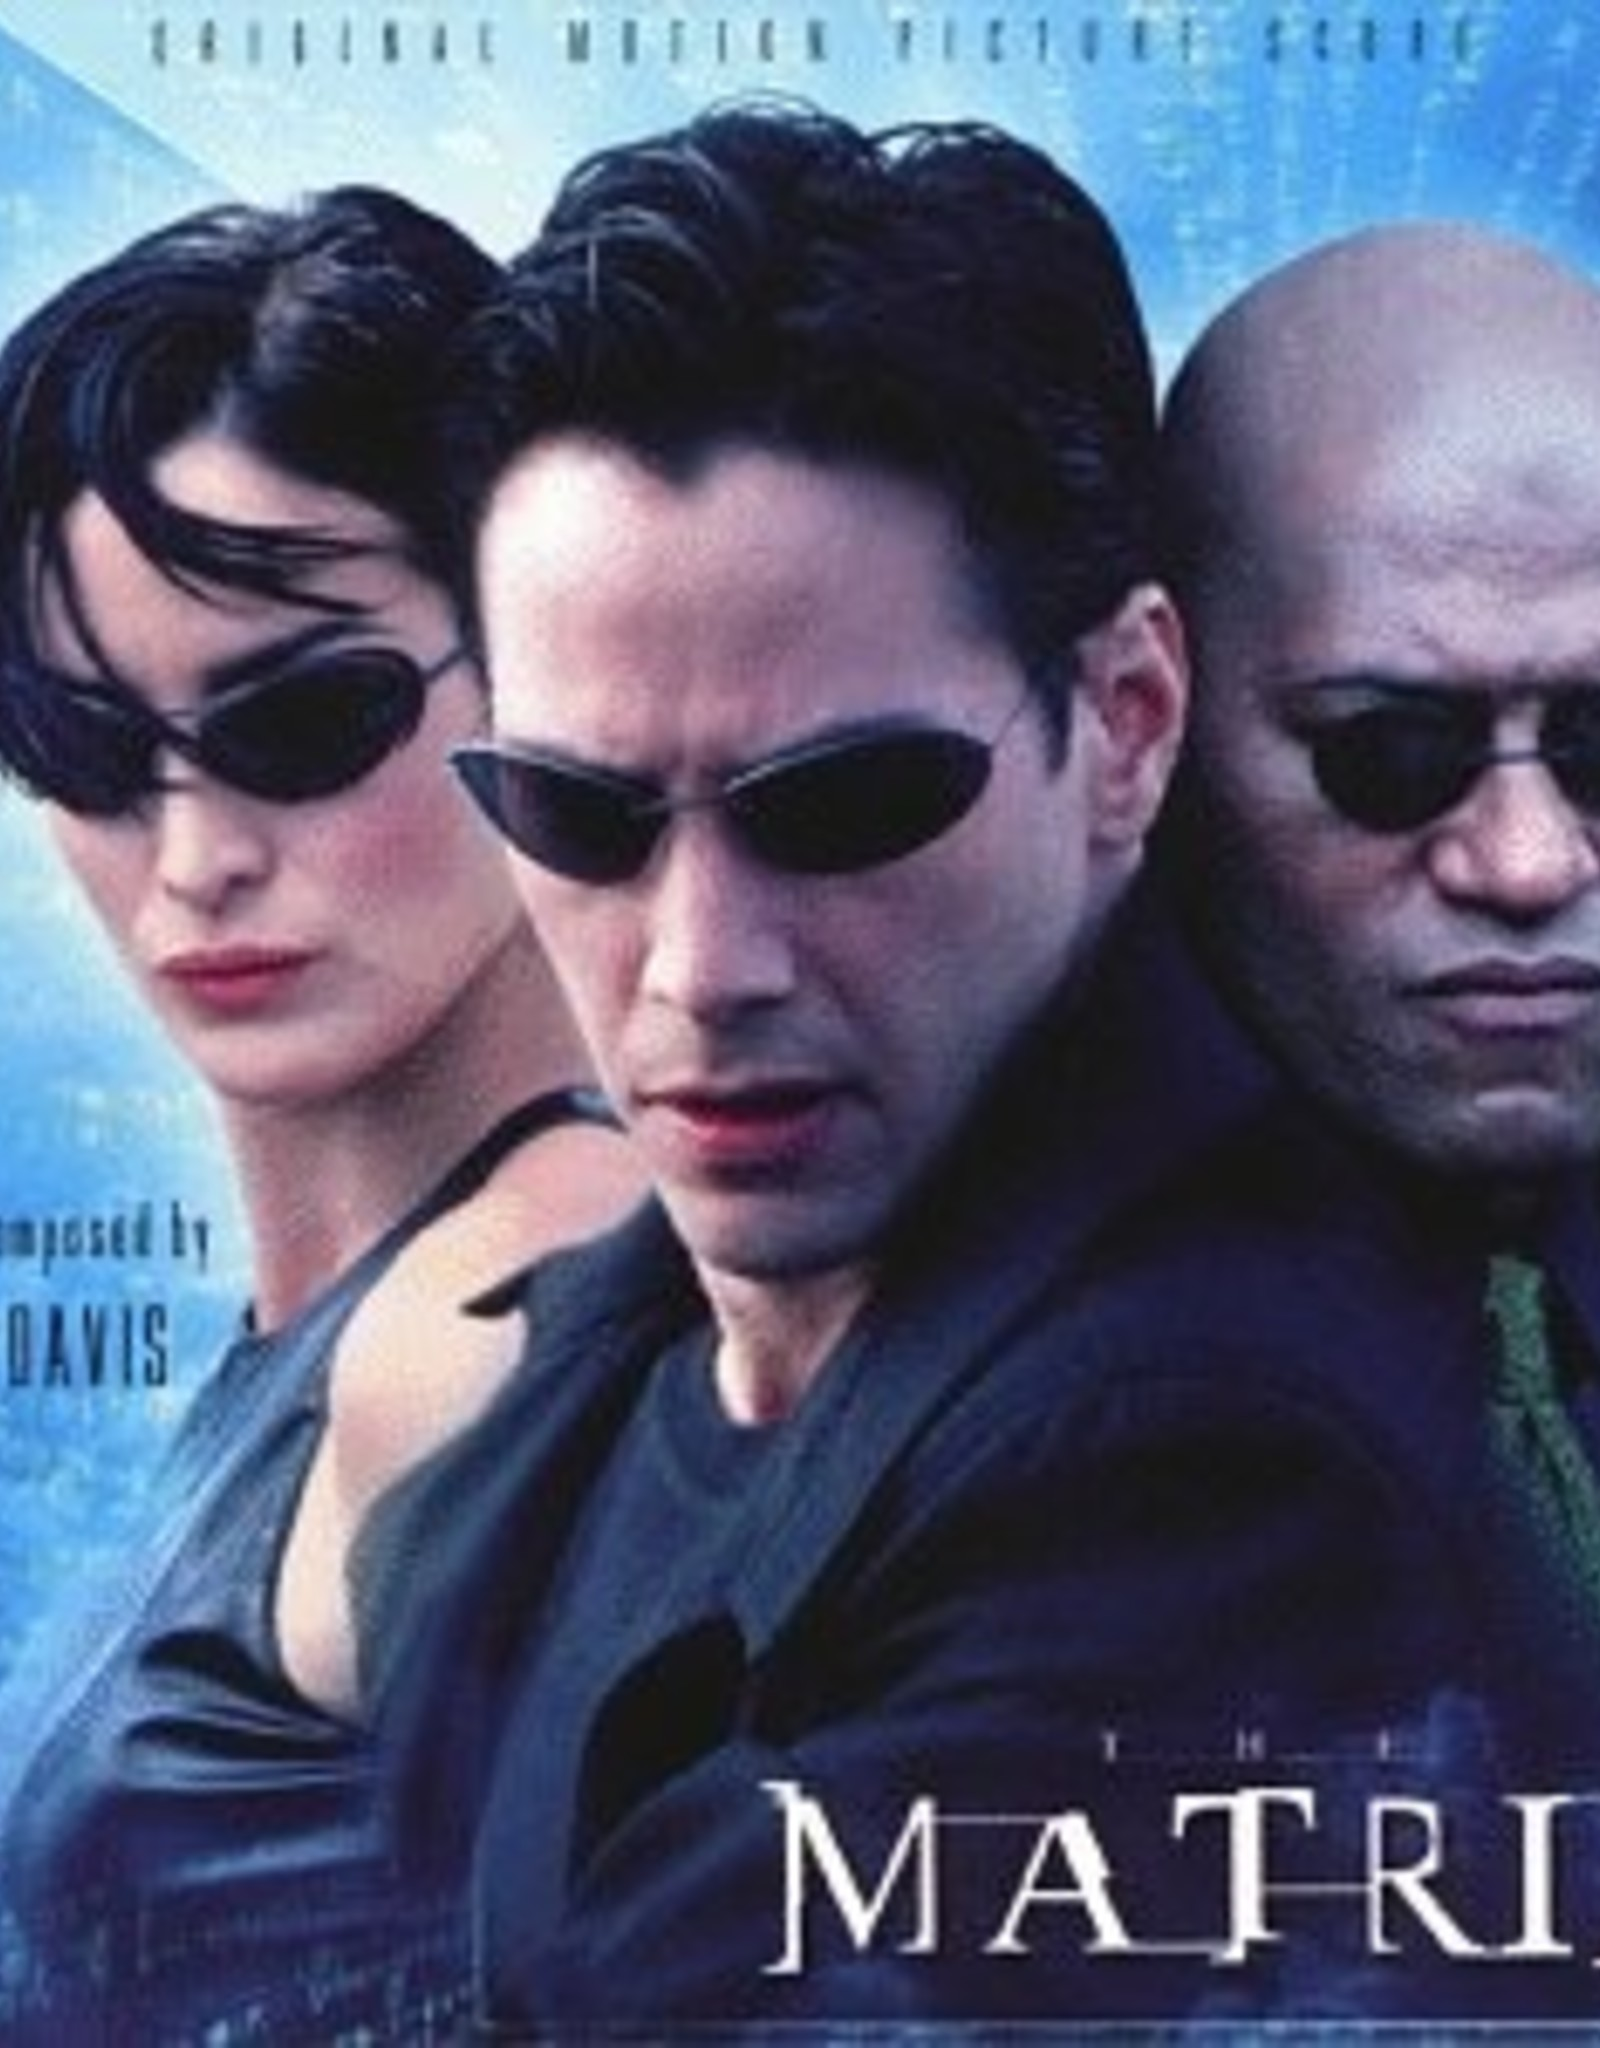 Don Davis - Matrix Ost (Picture Disc)